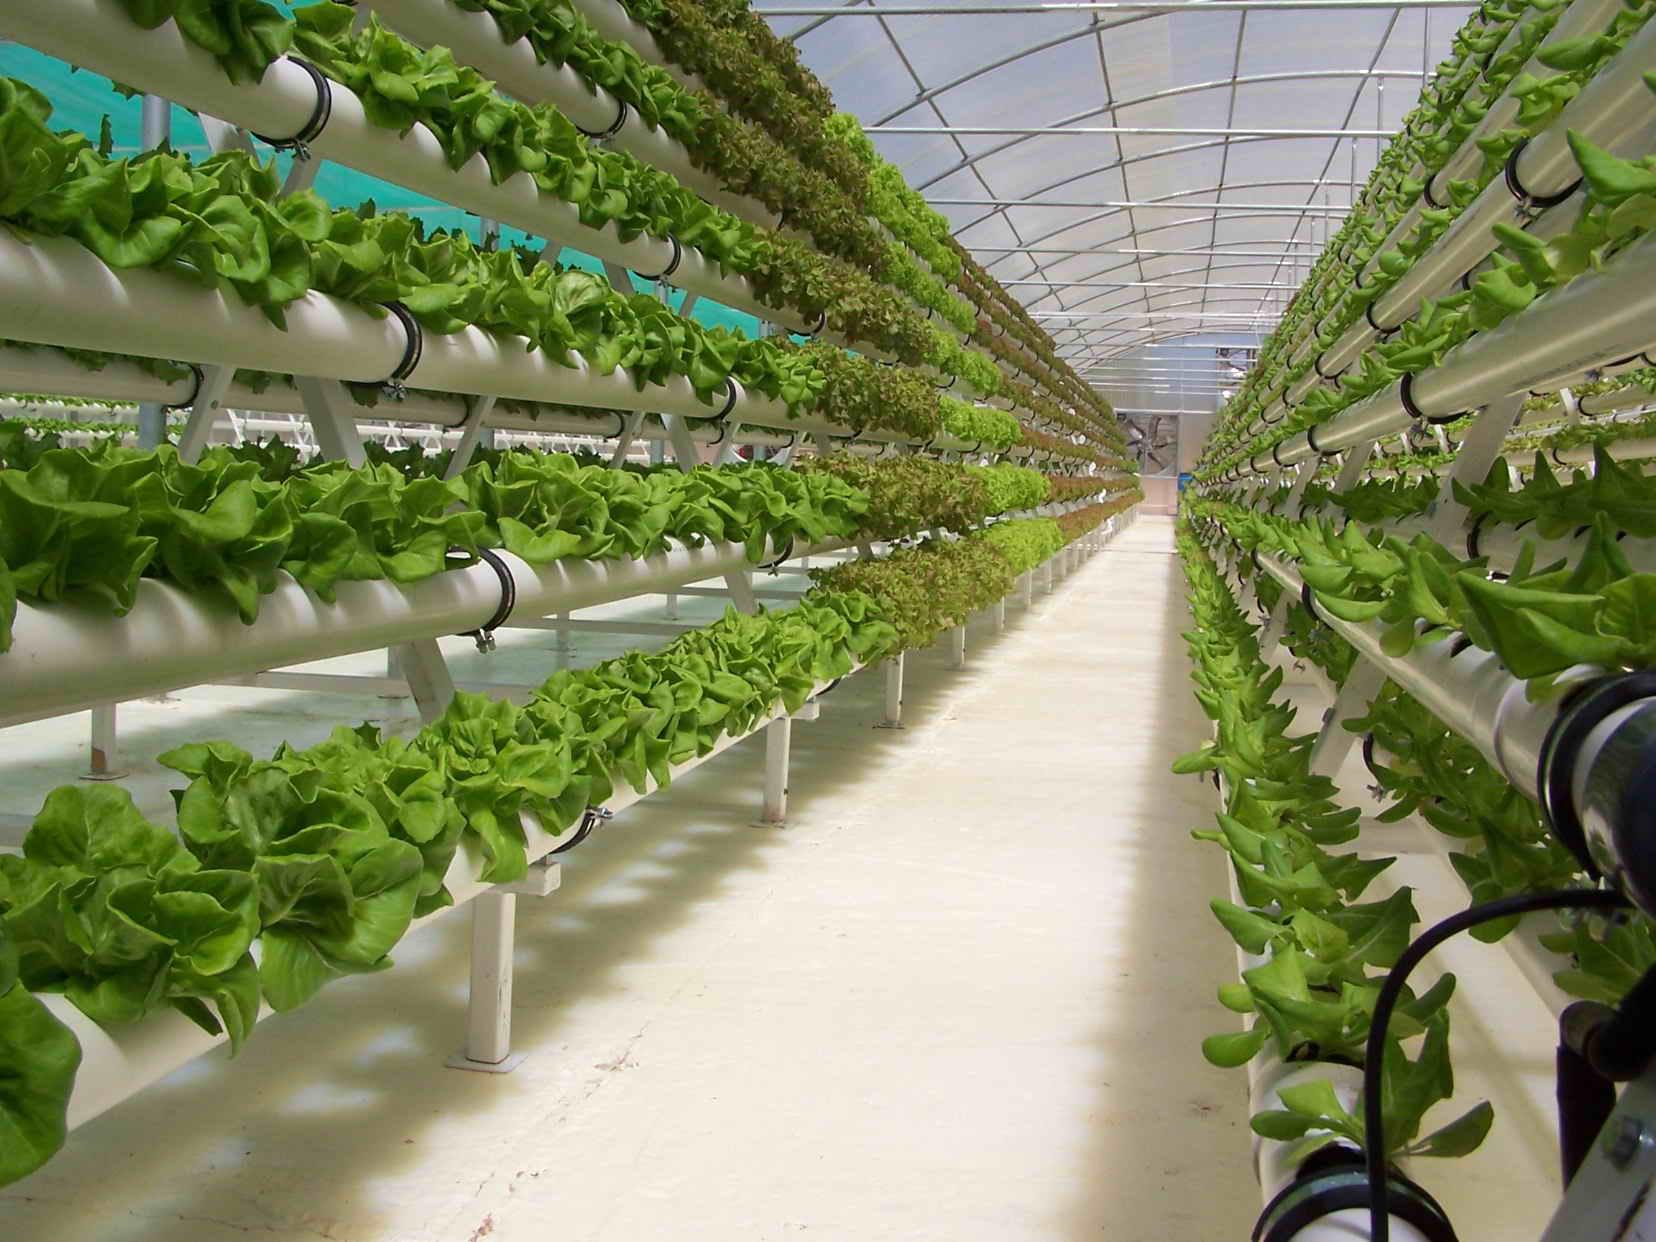 Выращивание зелени в домашних условиях гидропоника гидропоника выращивание марихуаны дома